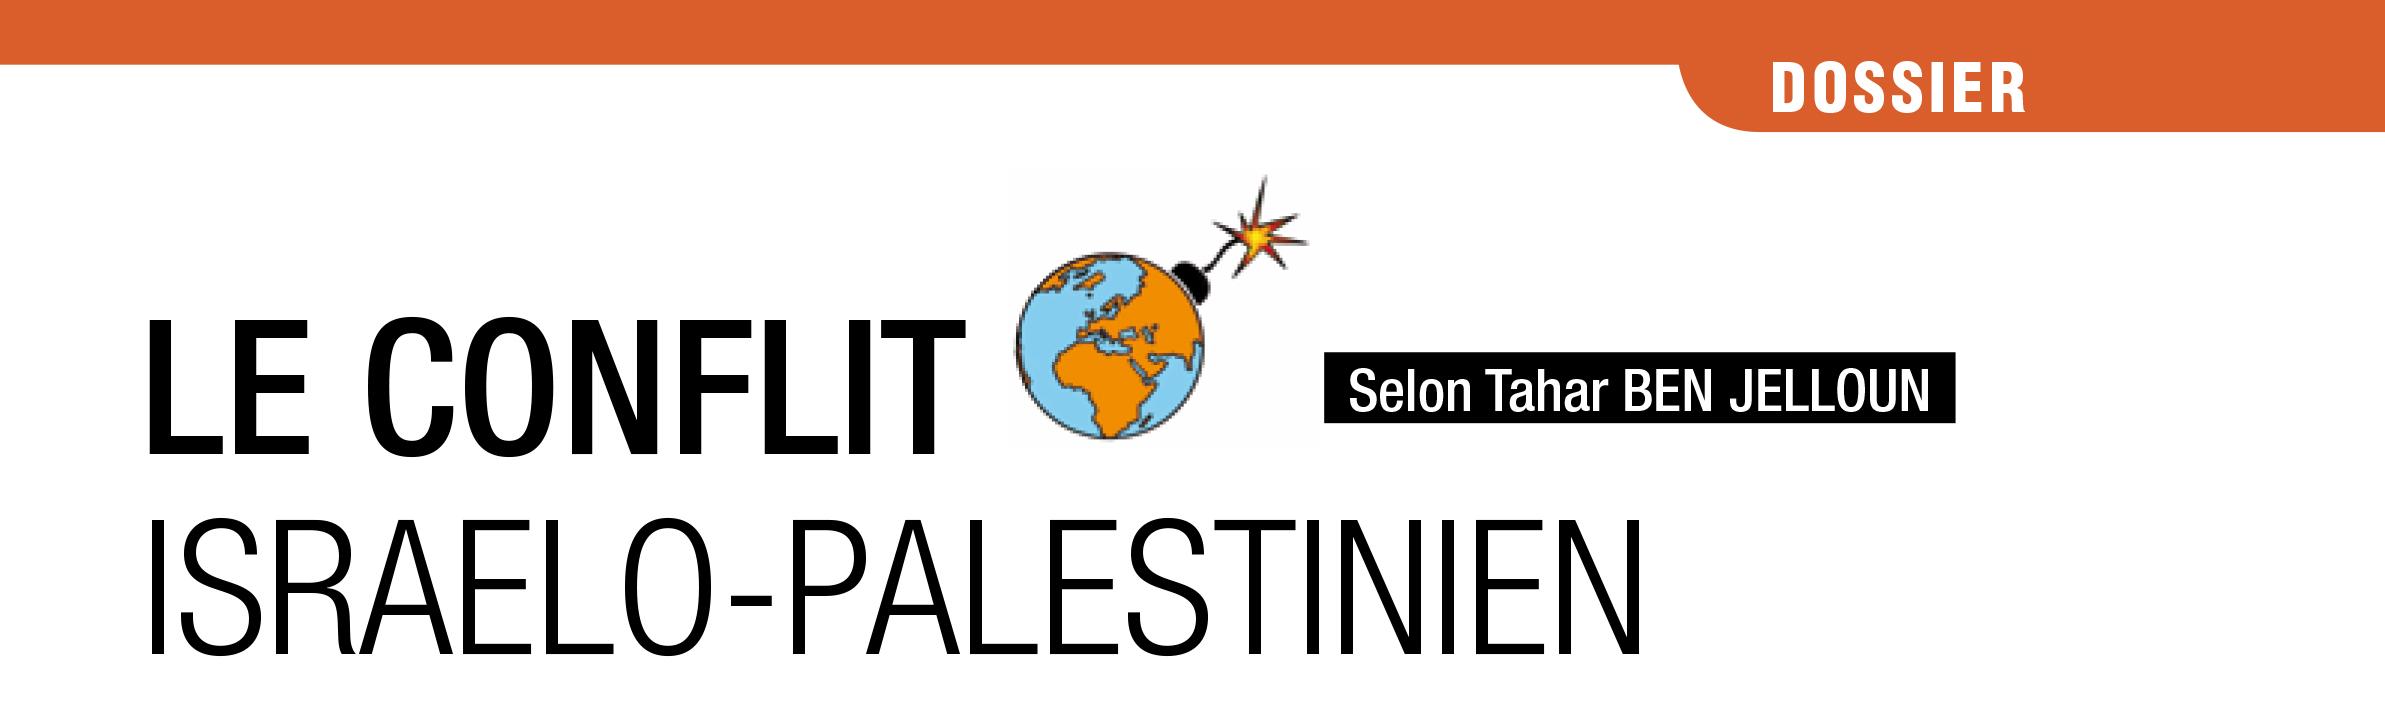 Le conflit israélo palestinien - selon Tahar Ben Jelloun